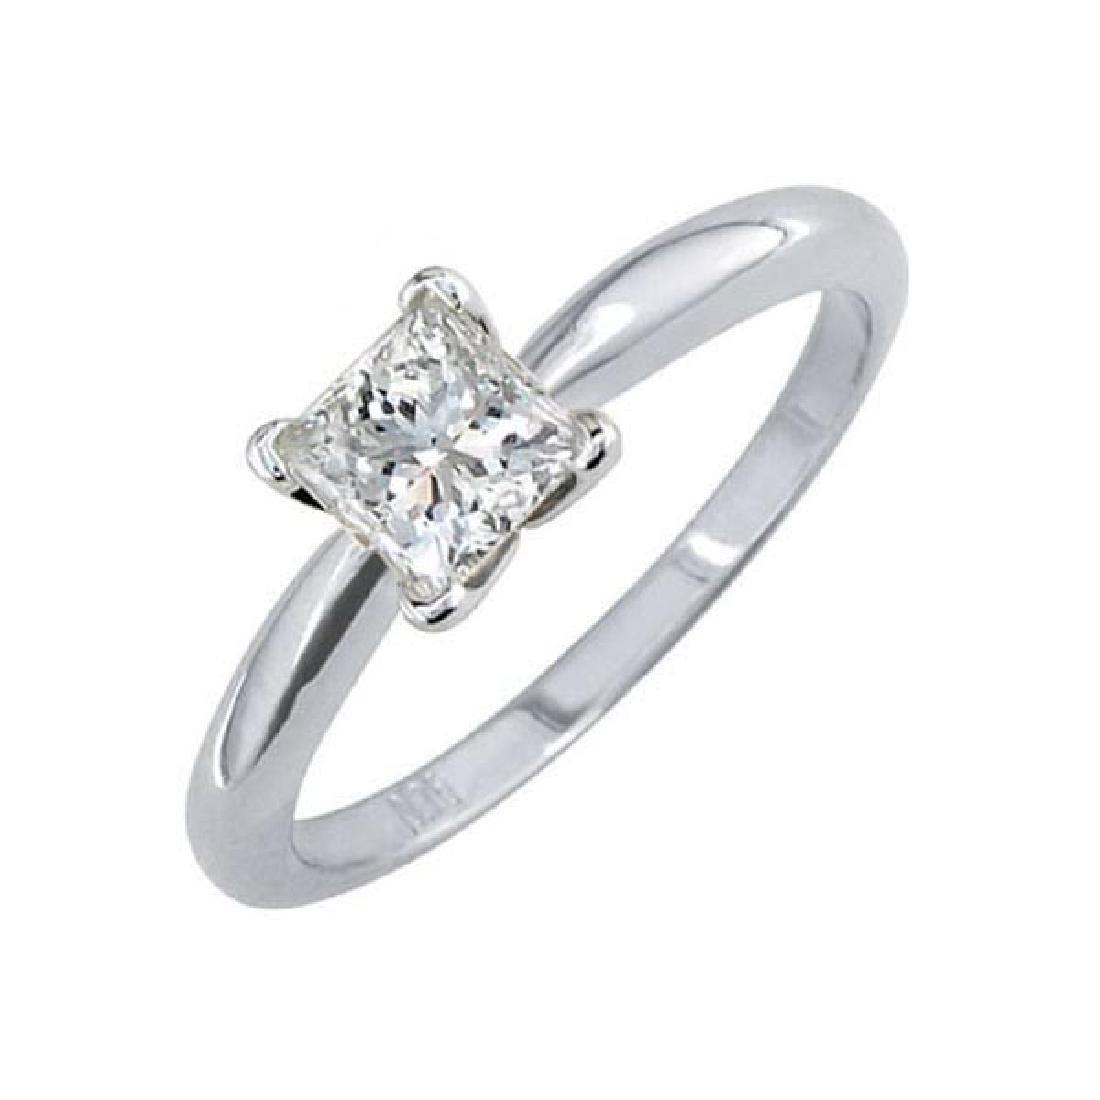 Certified 1.04 CTW Princess Diamond Solitaire 14k Ring